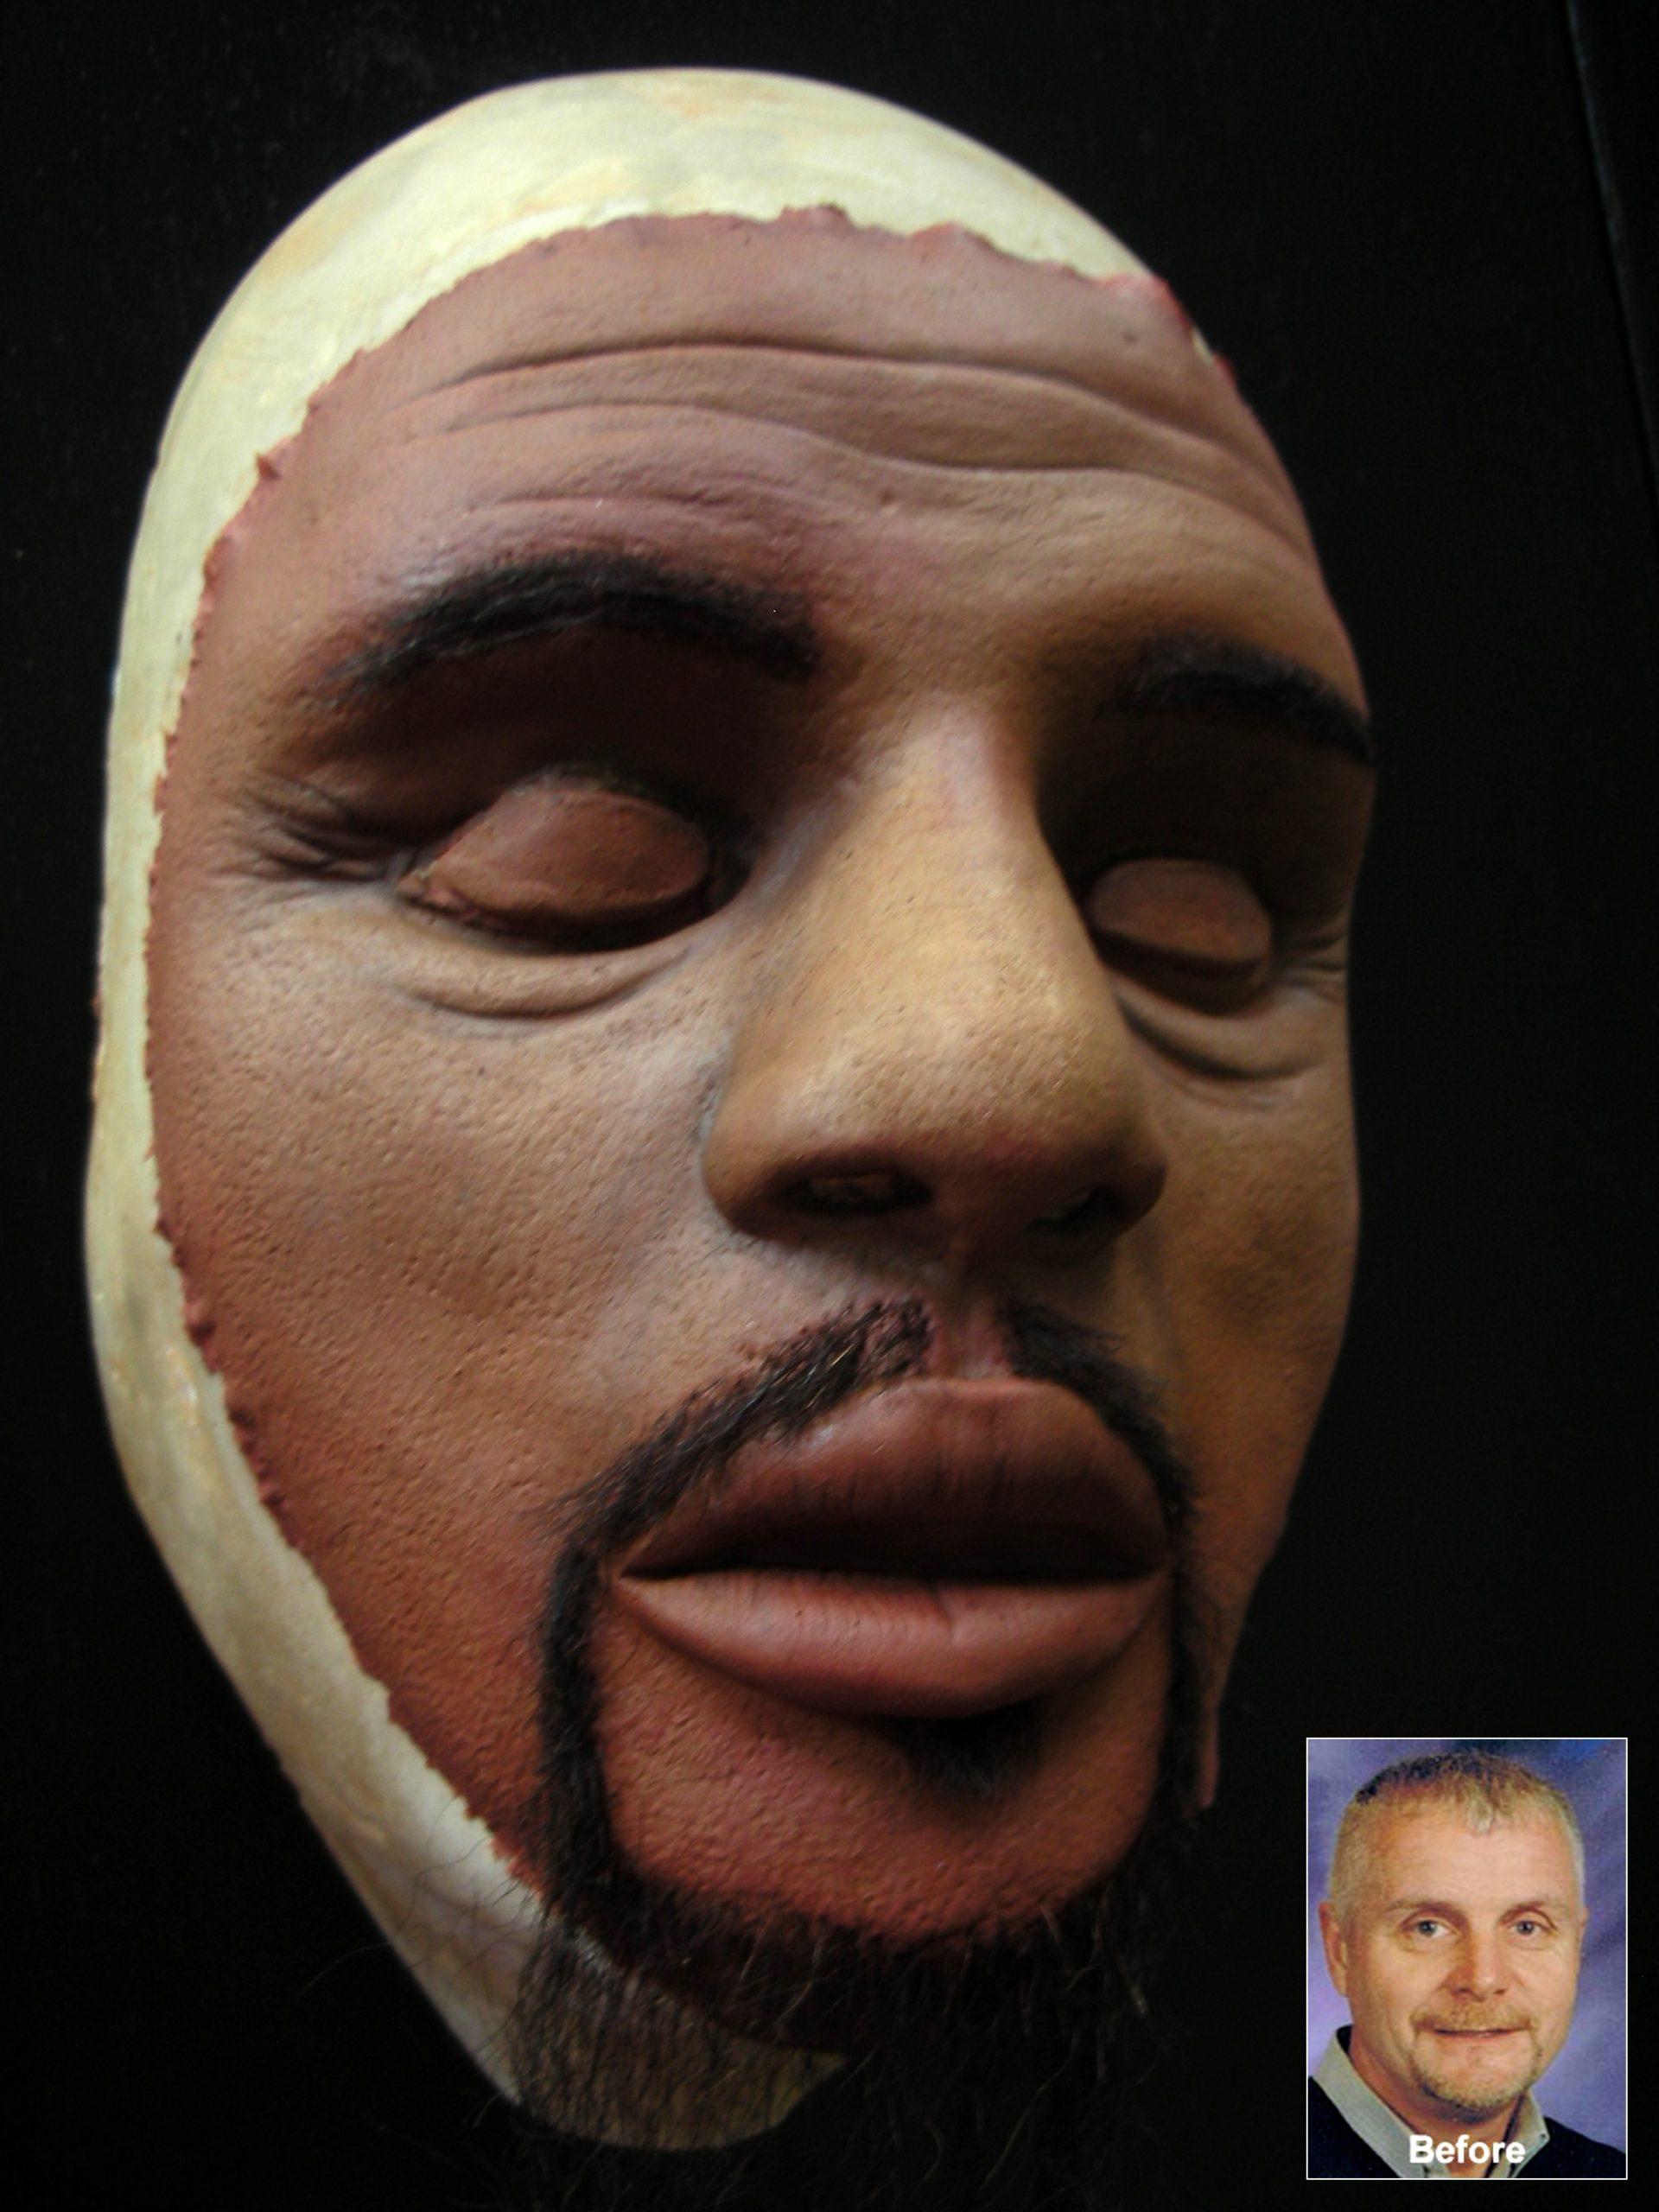 Black American Sculpt, Larry S. in Toledo, Sculpt, Appliance by Tim Vittetoe - ImpaQt FX